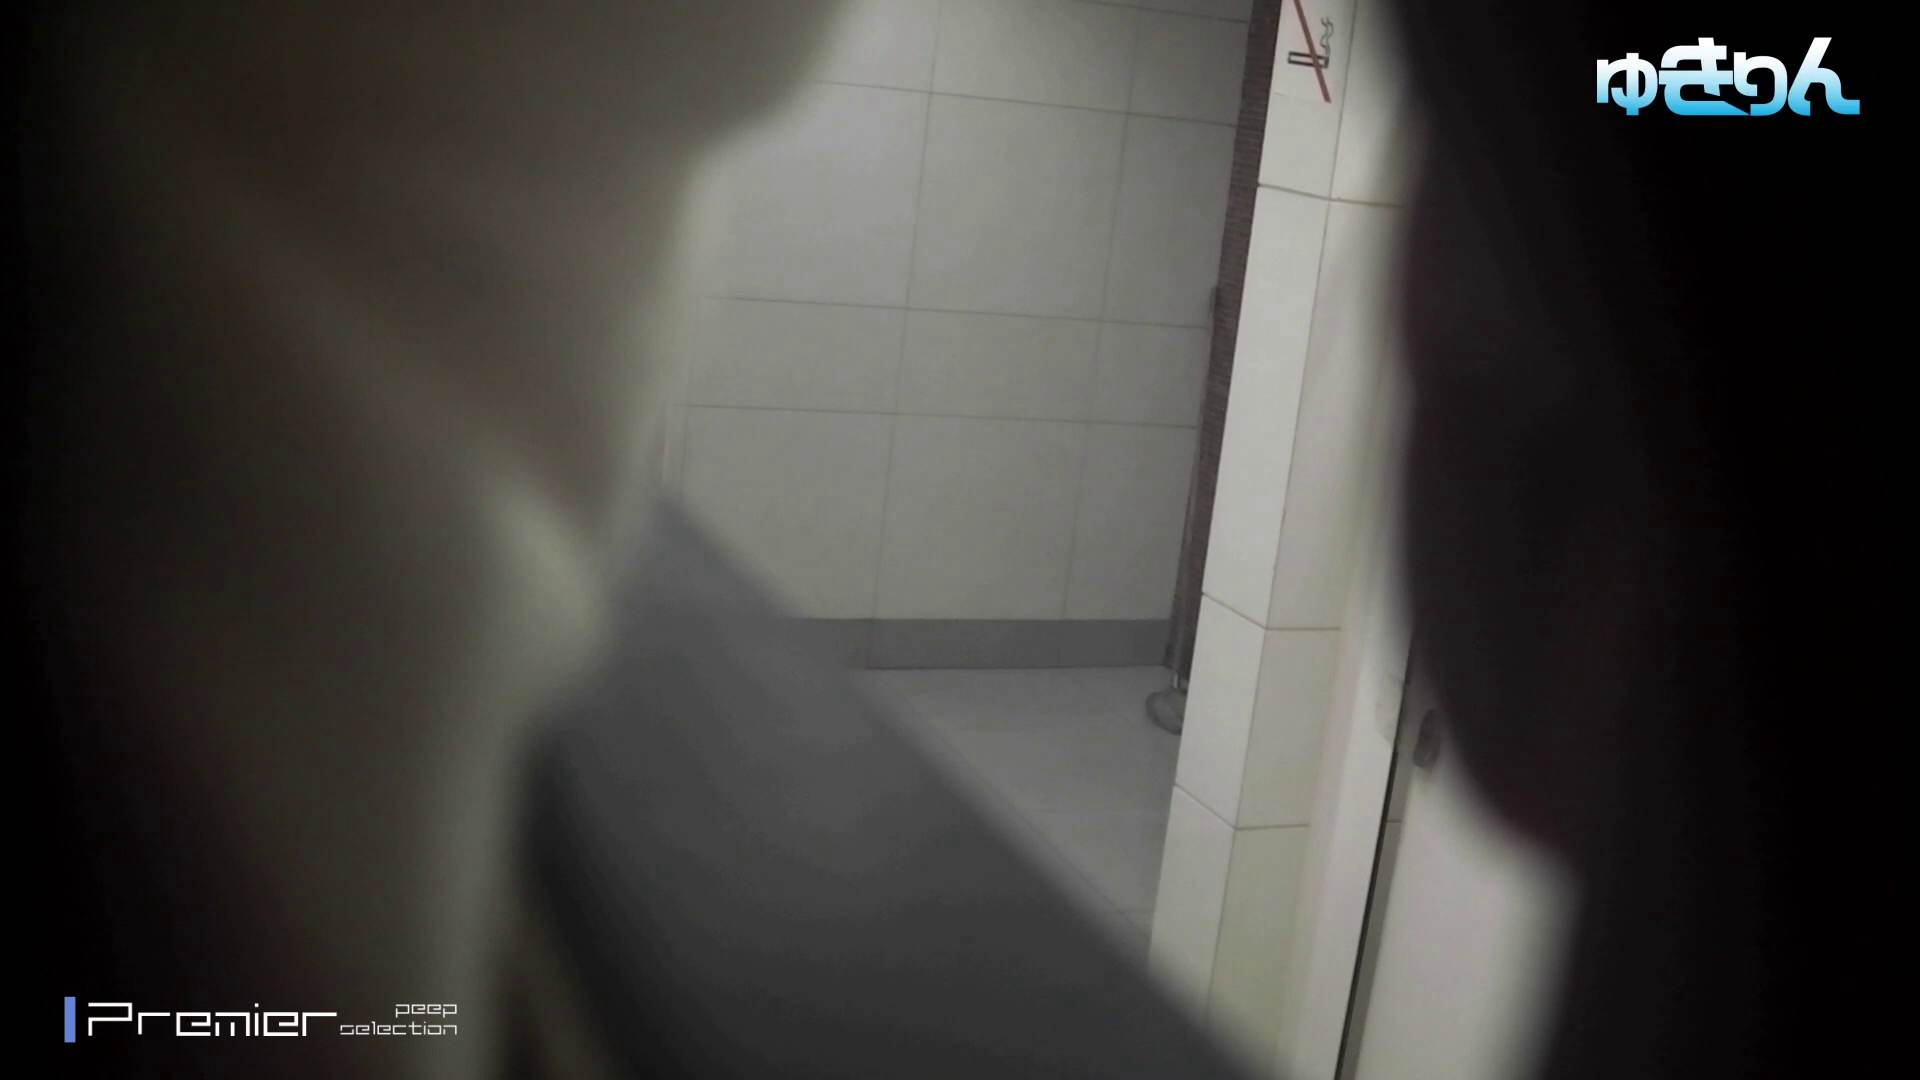 cm友達同士三人グループの二人を同時に捕獲【新世界の射窓からNo120】 洗面所   グループ  58pic 25